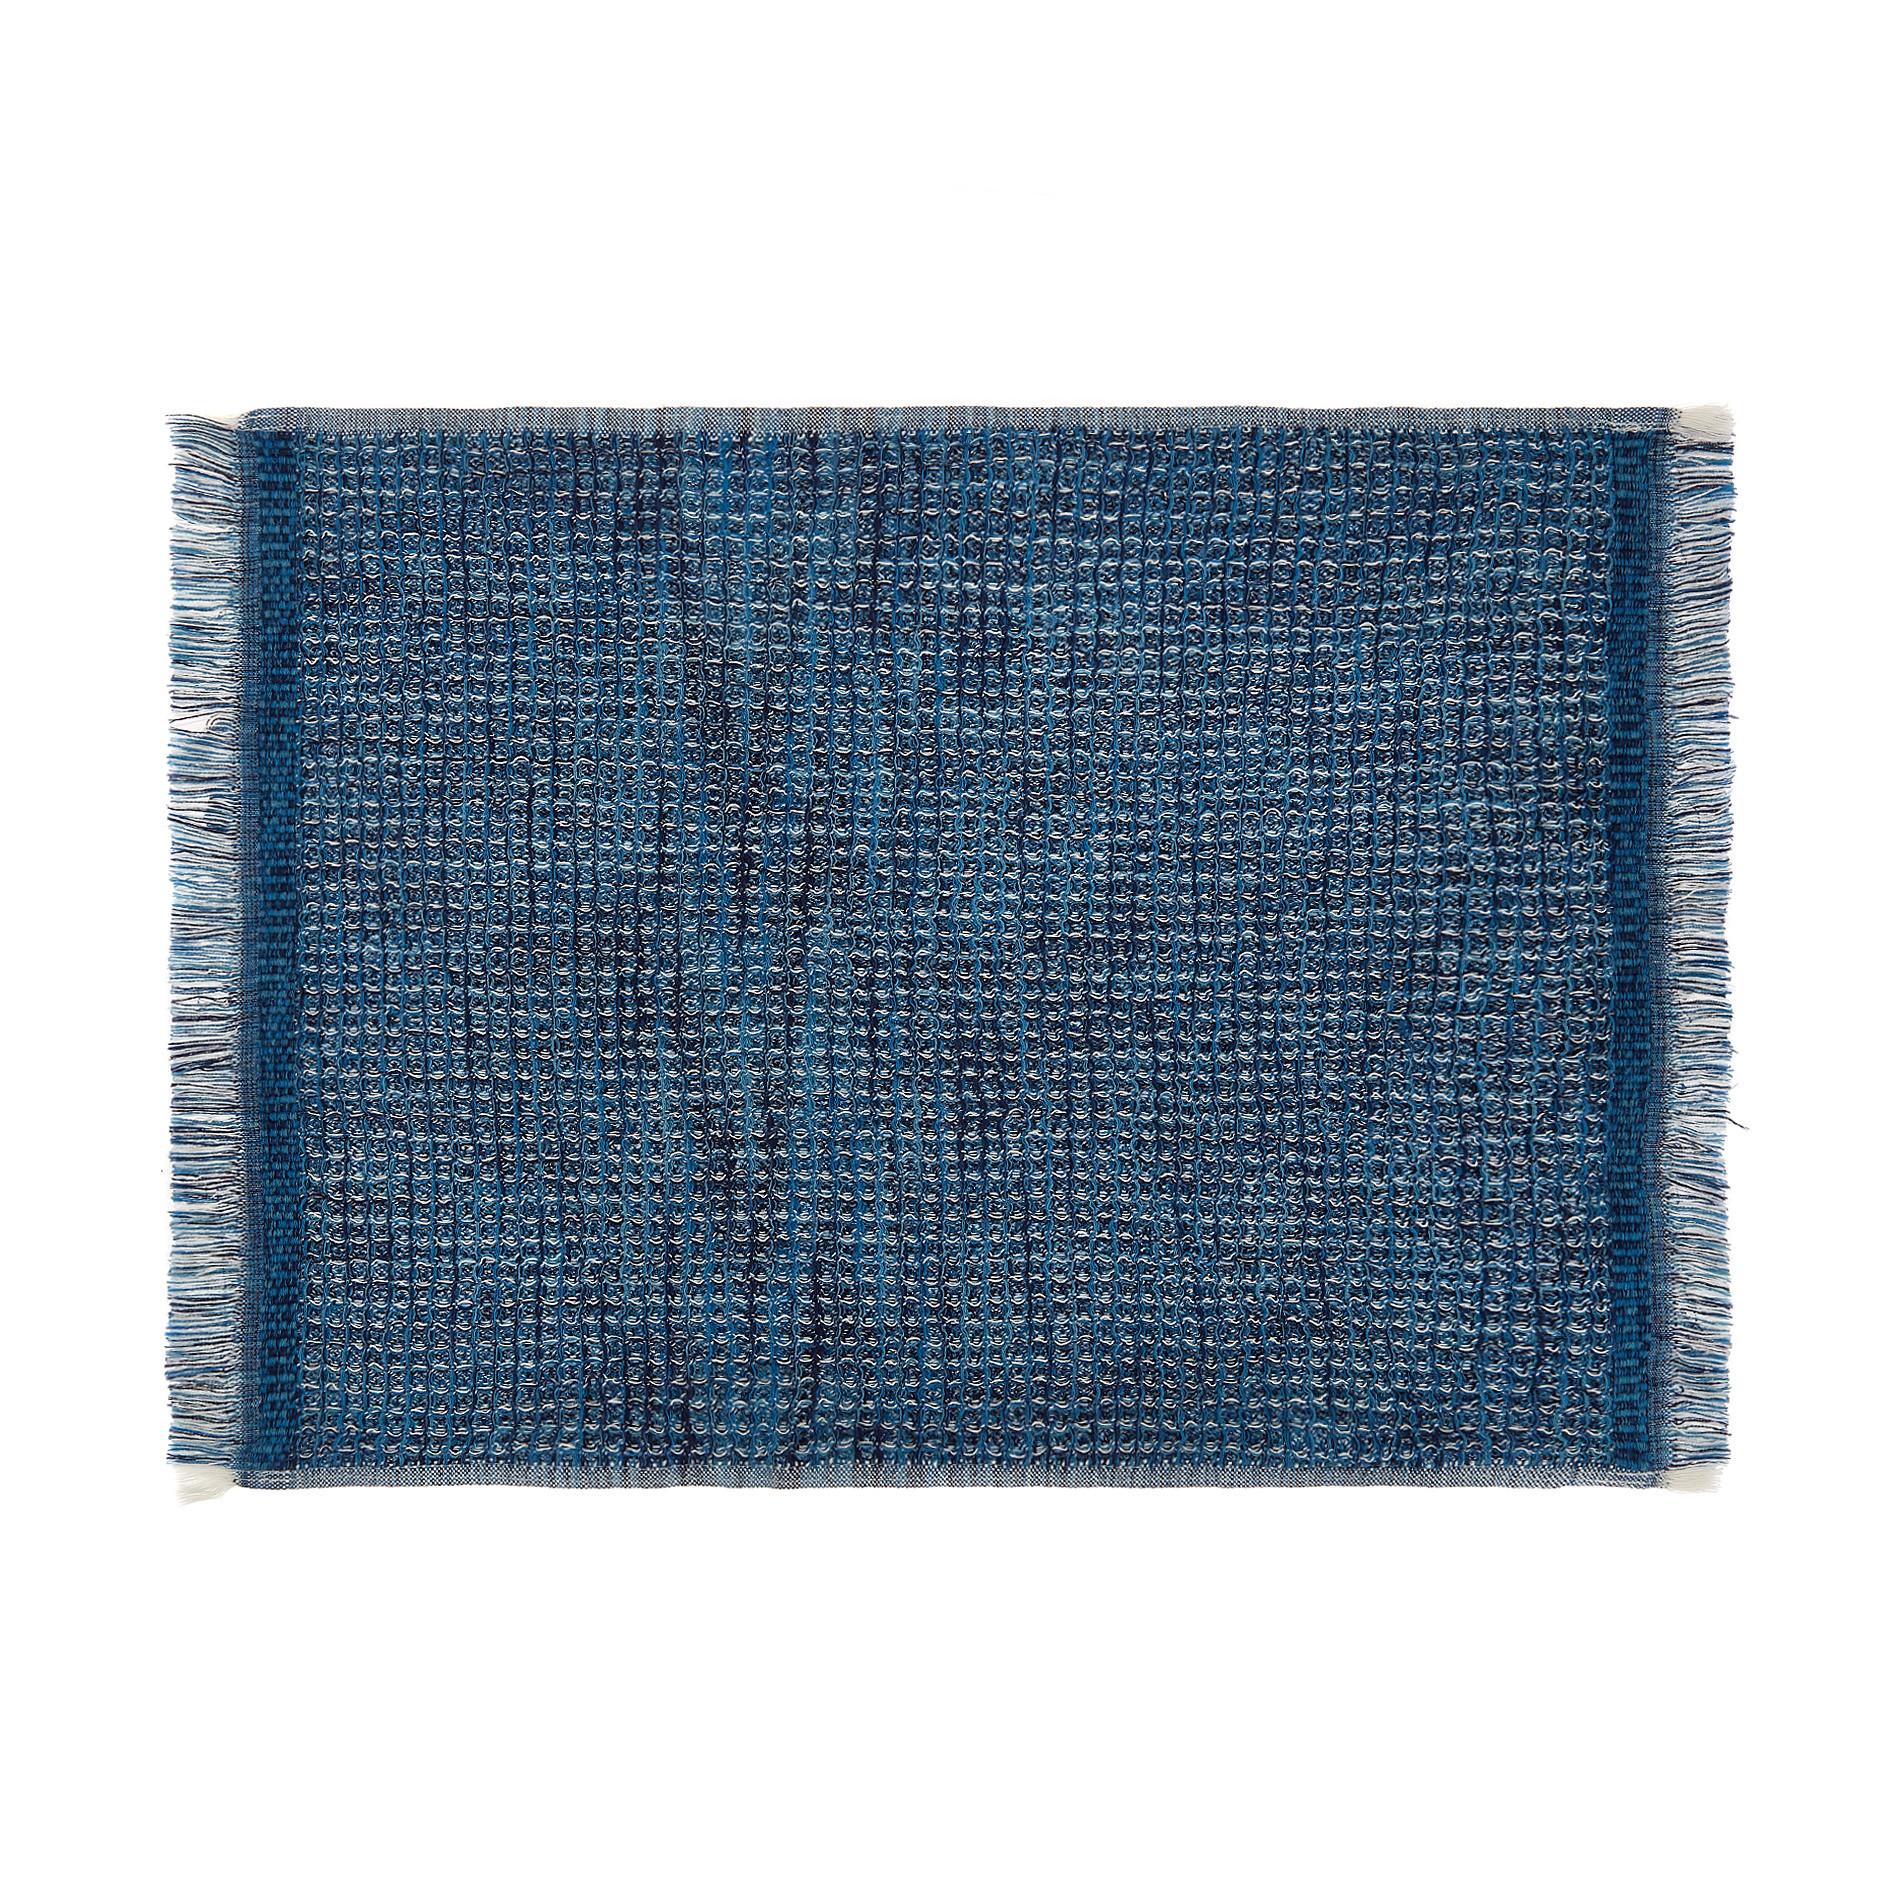 Asciugamano cotone nido d'ape effetto melange, Blu, large image number 1